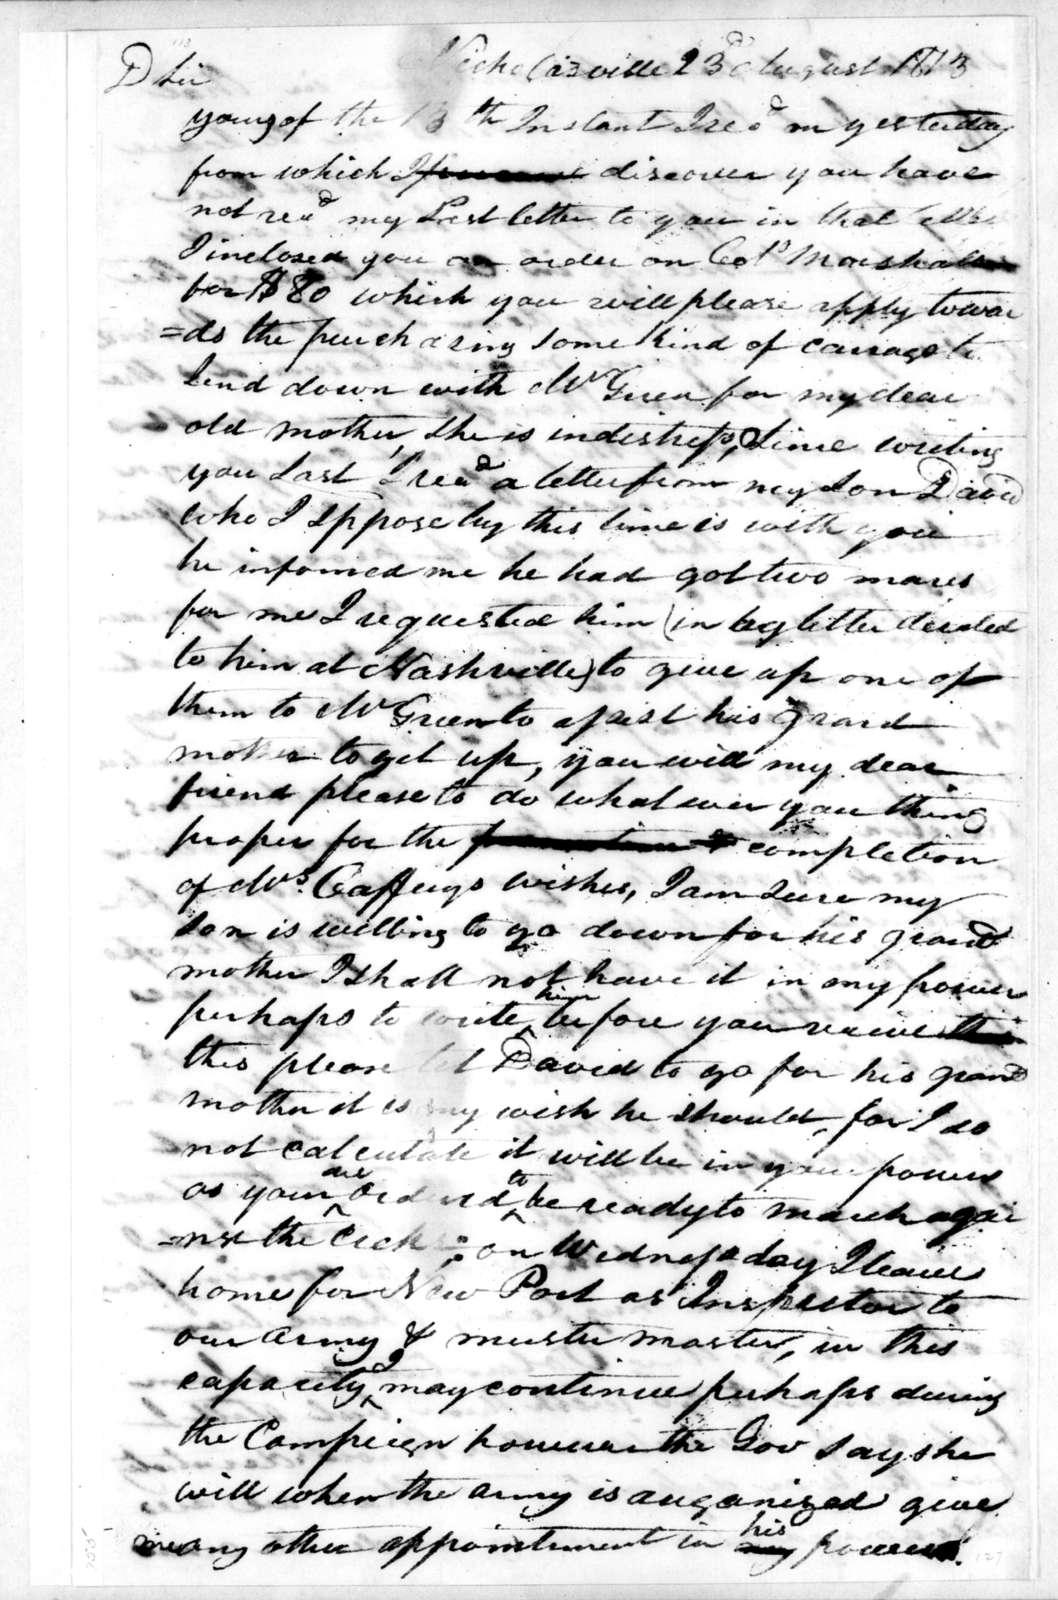 George Walker to Andrew Jackson, August 23, 1813